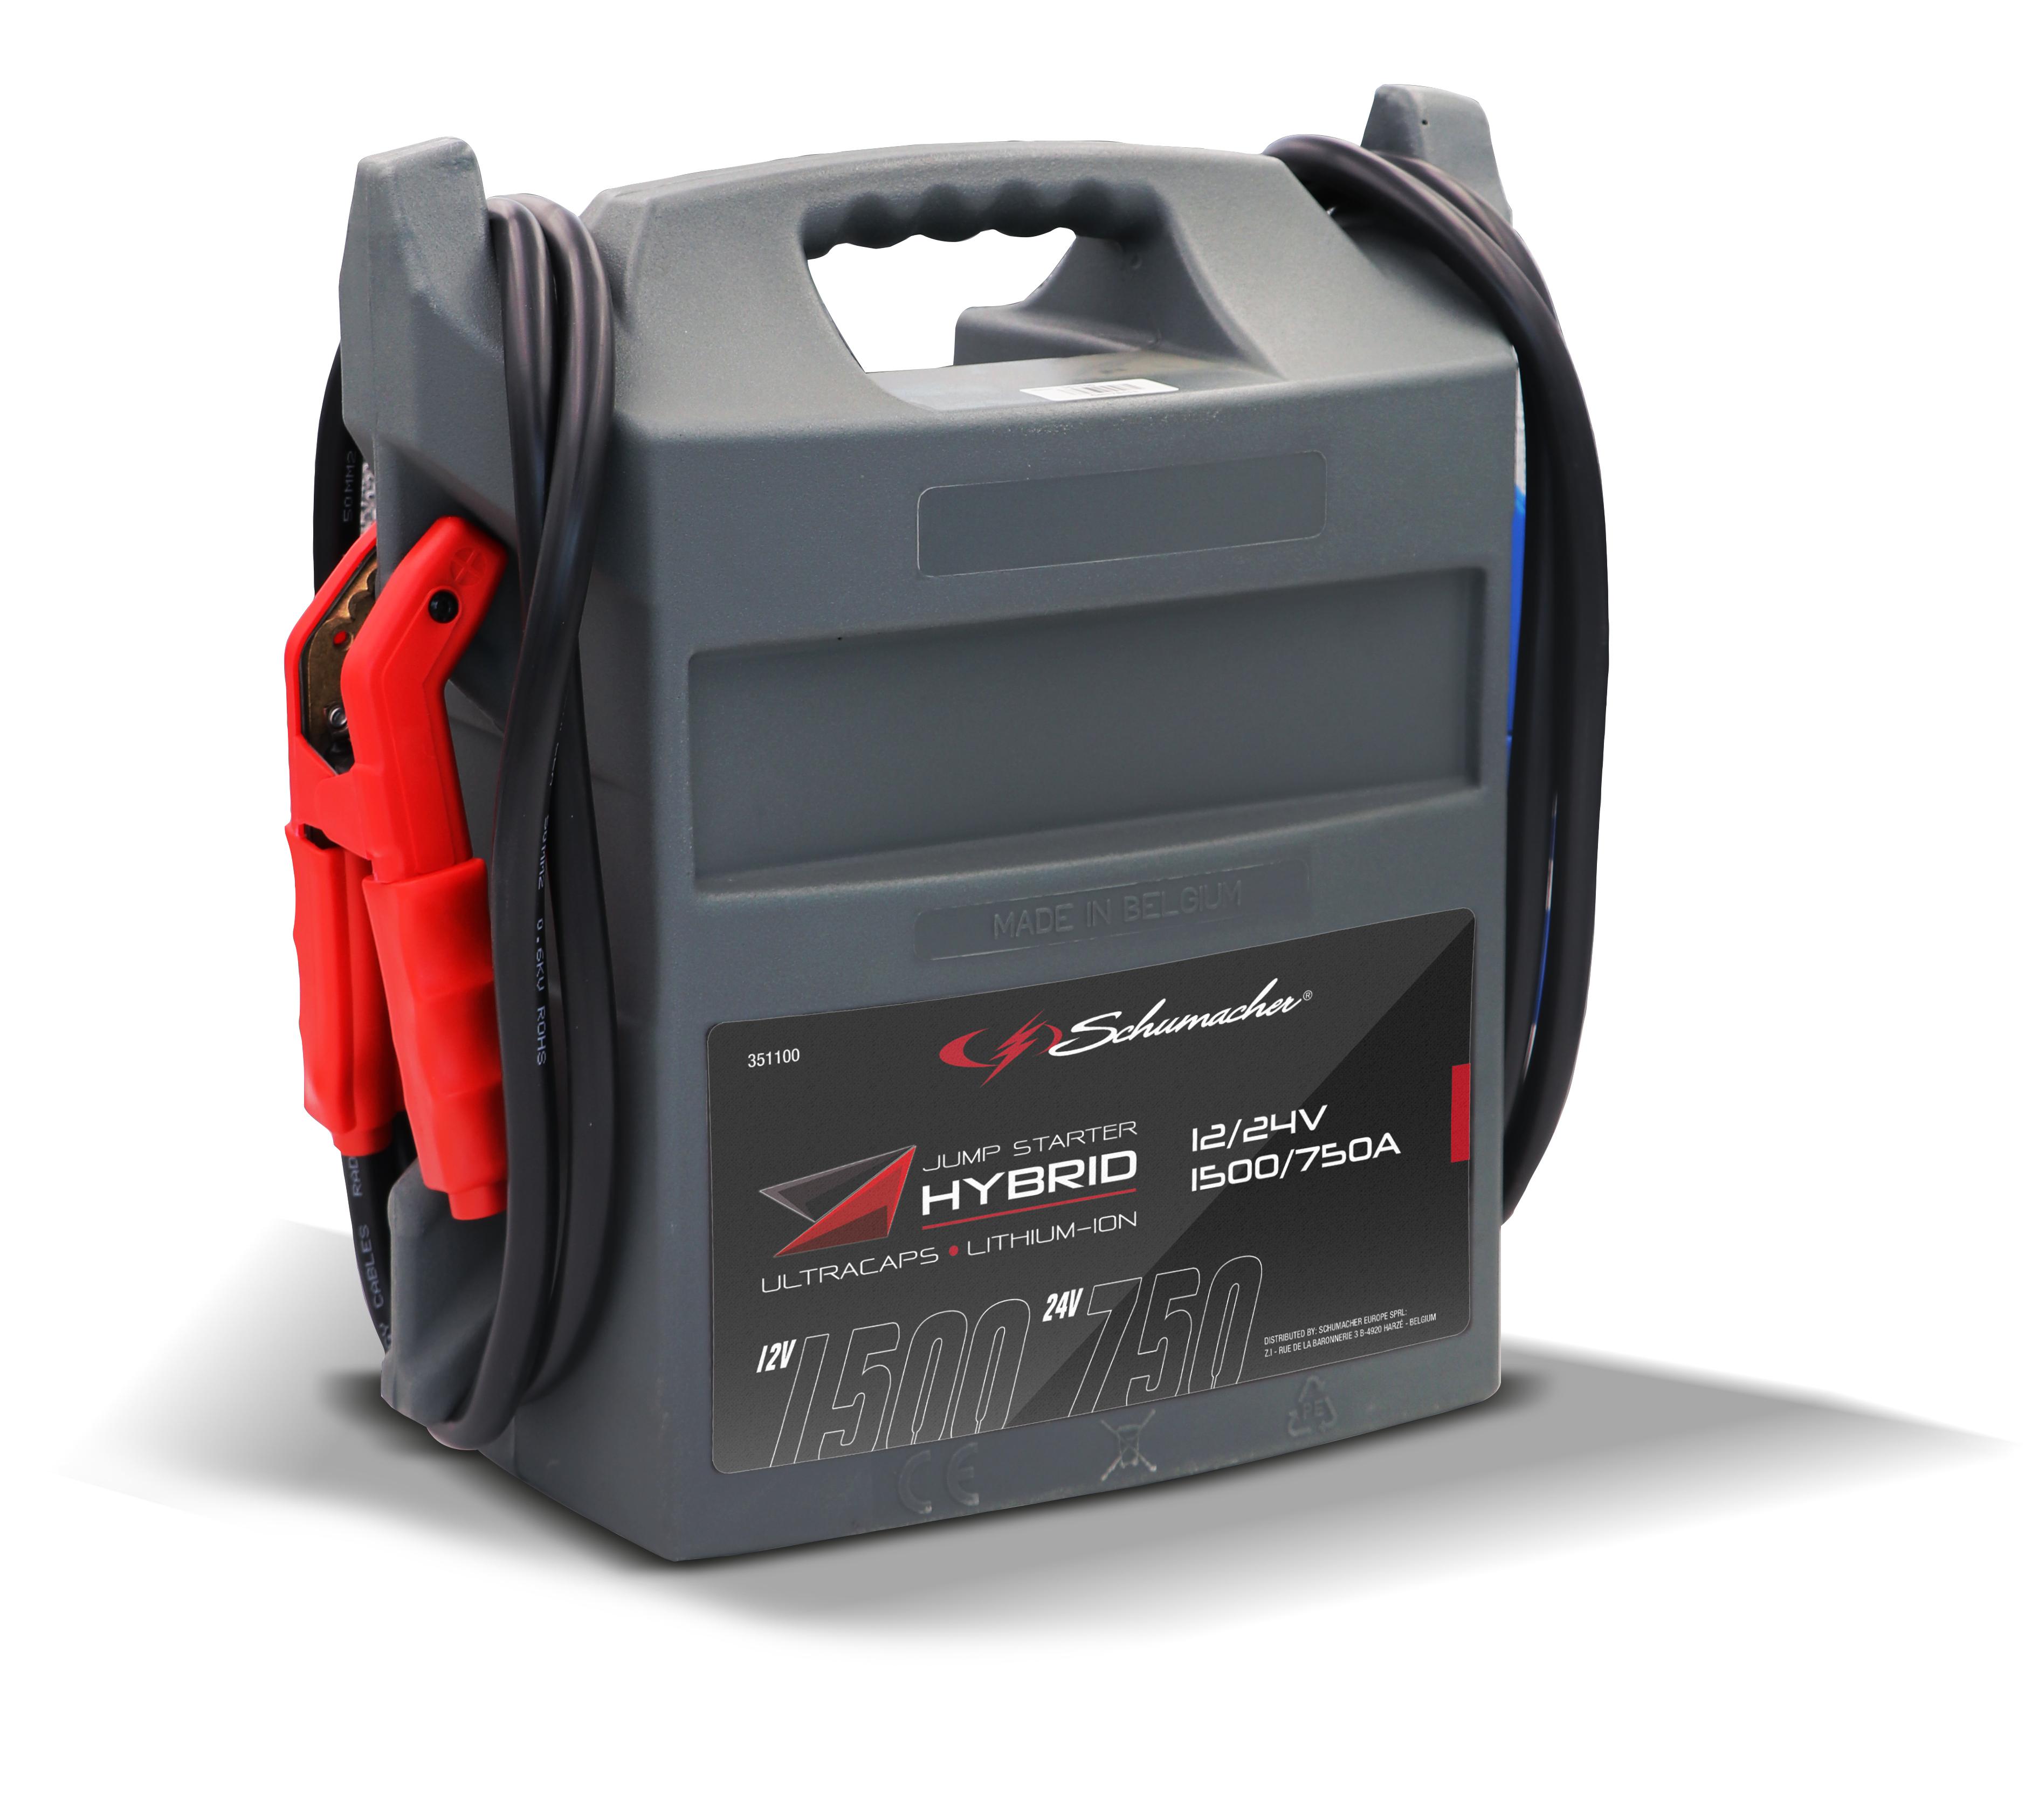 Startbooster hybrid 12V/24V